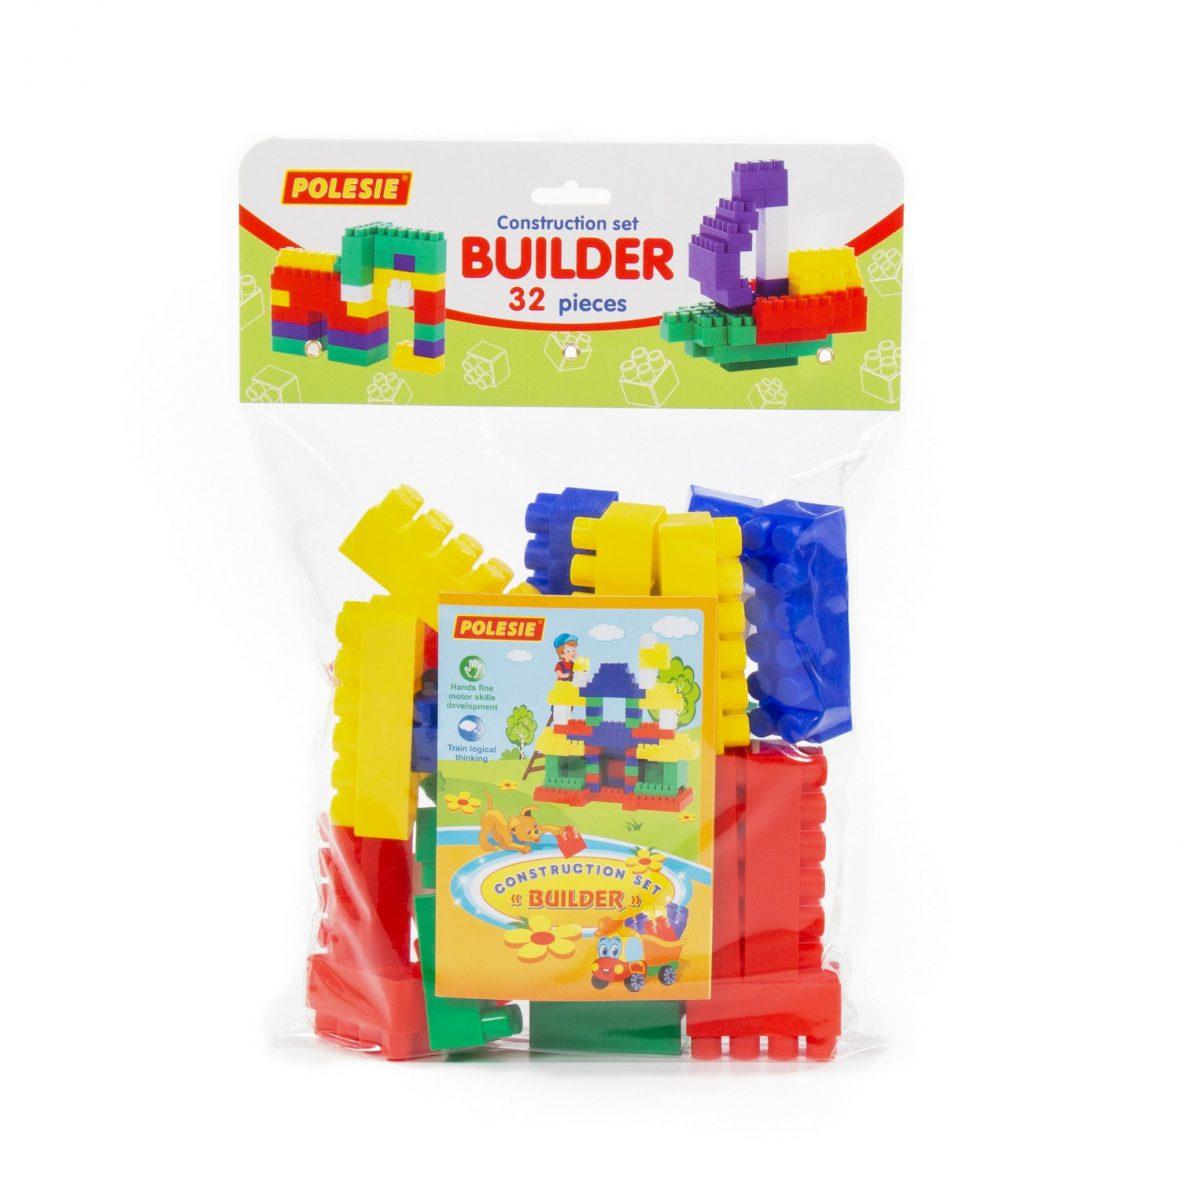 Construction set Builder – 32